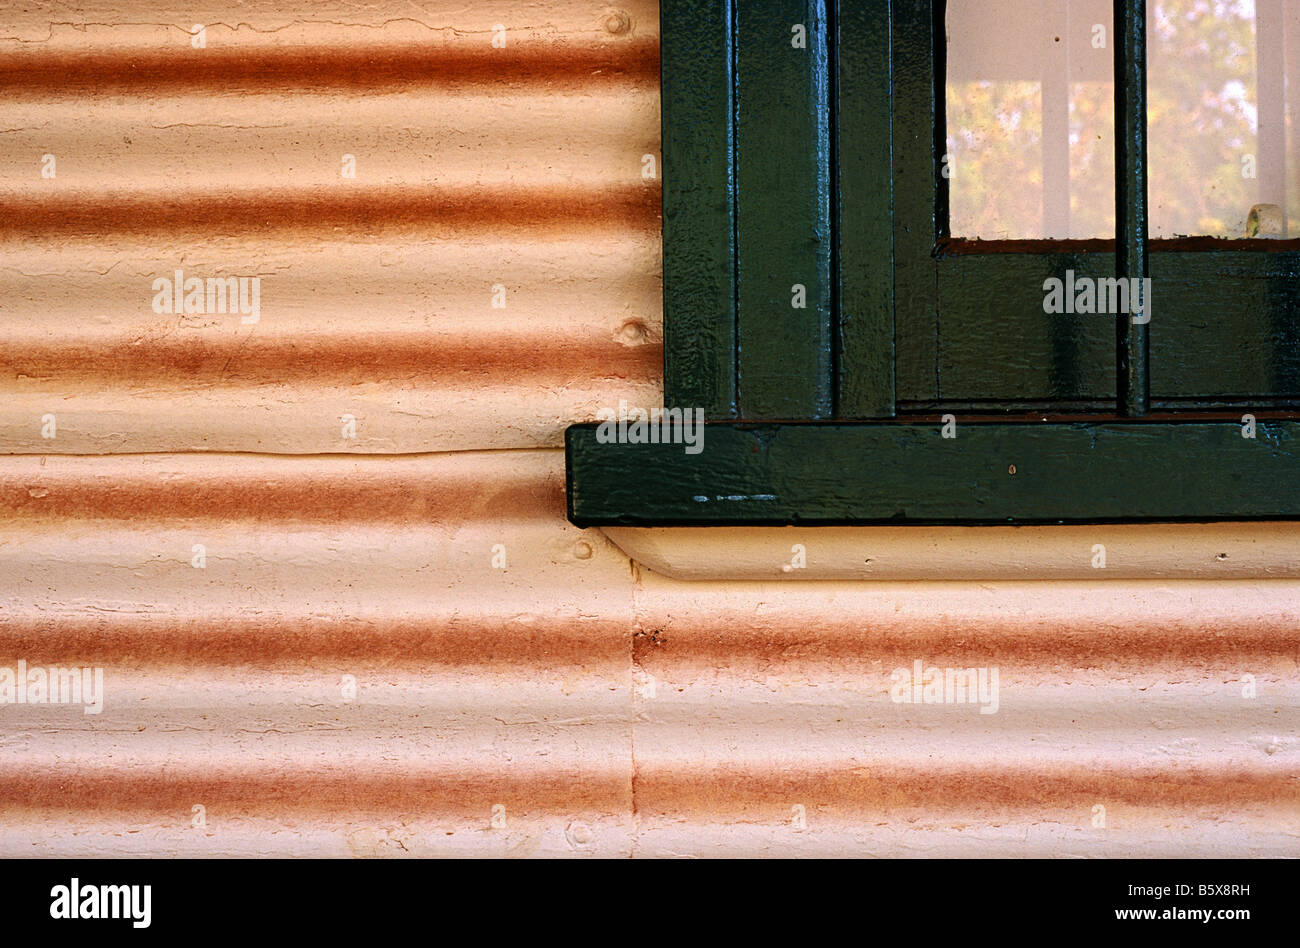 Wellblech, Australien Stockfoto